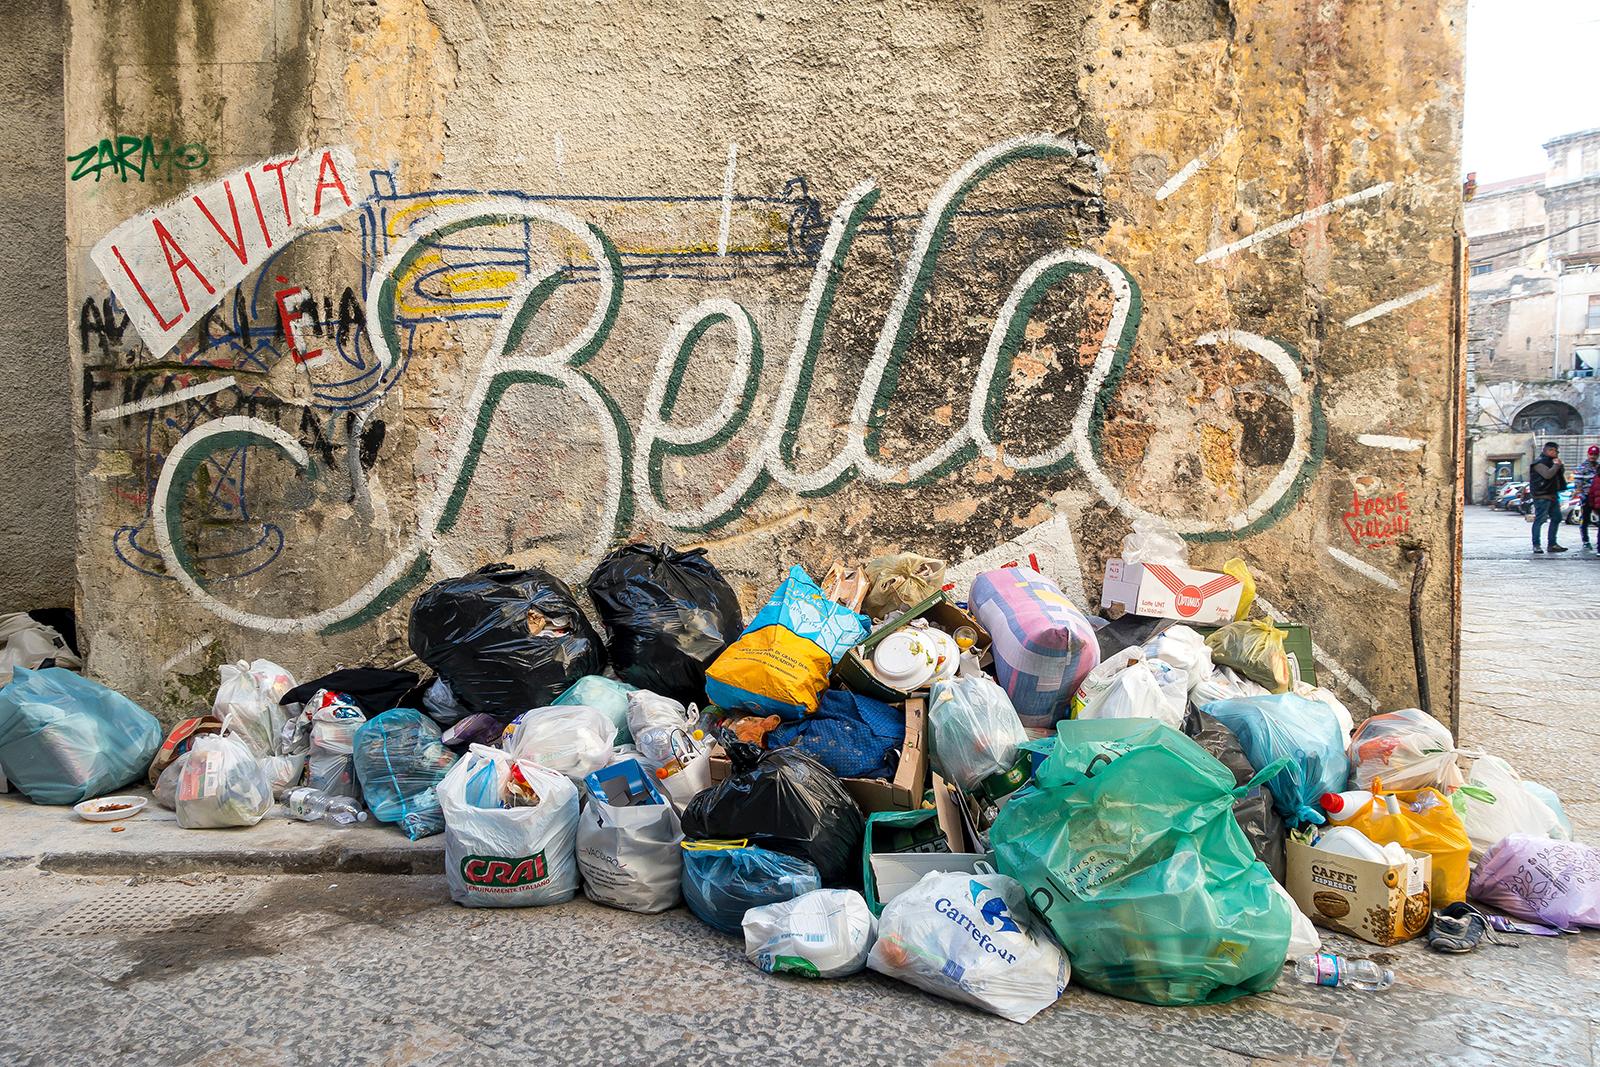 "A street corner featuring a ""La vita bella"" mural and a pile of trash bags."